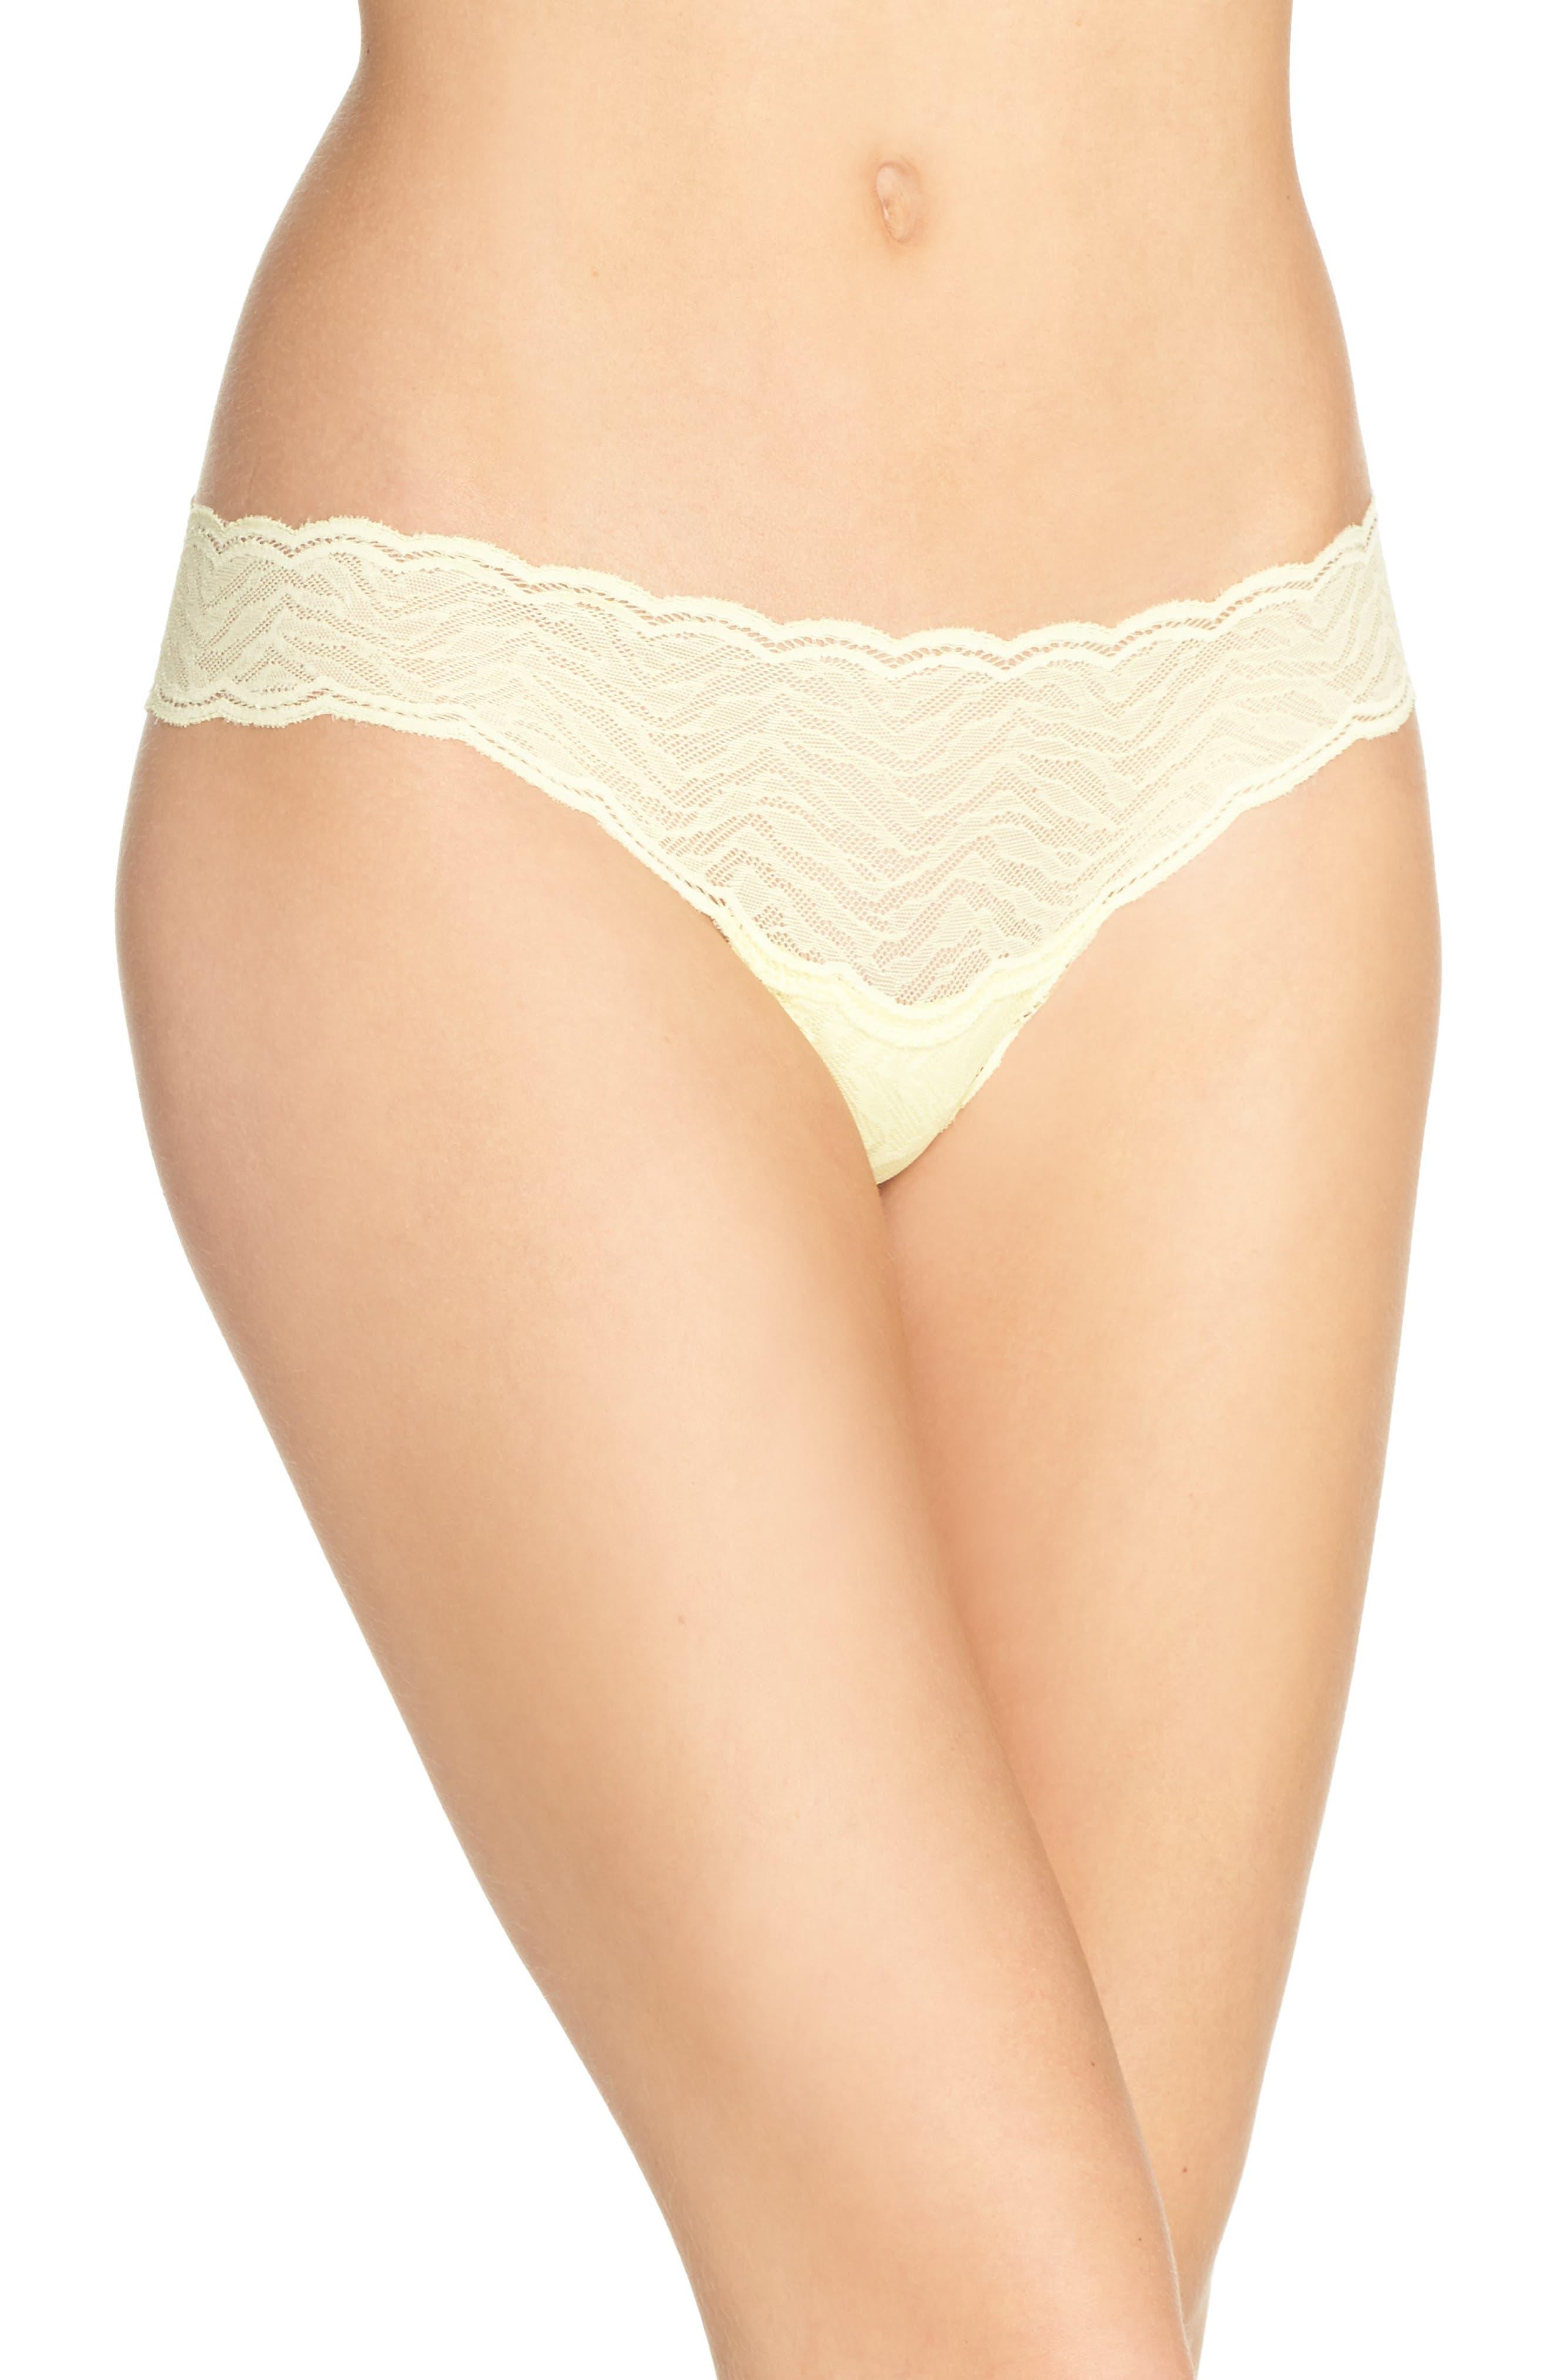 Cosabella Sweet Treats Lace Thong